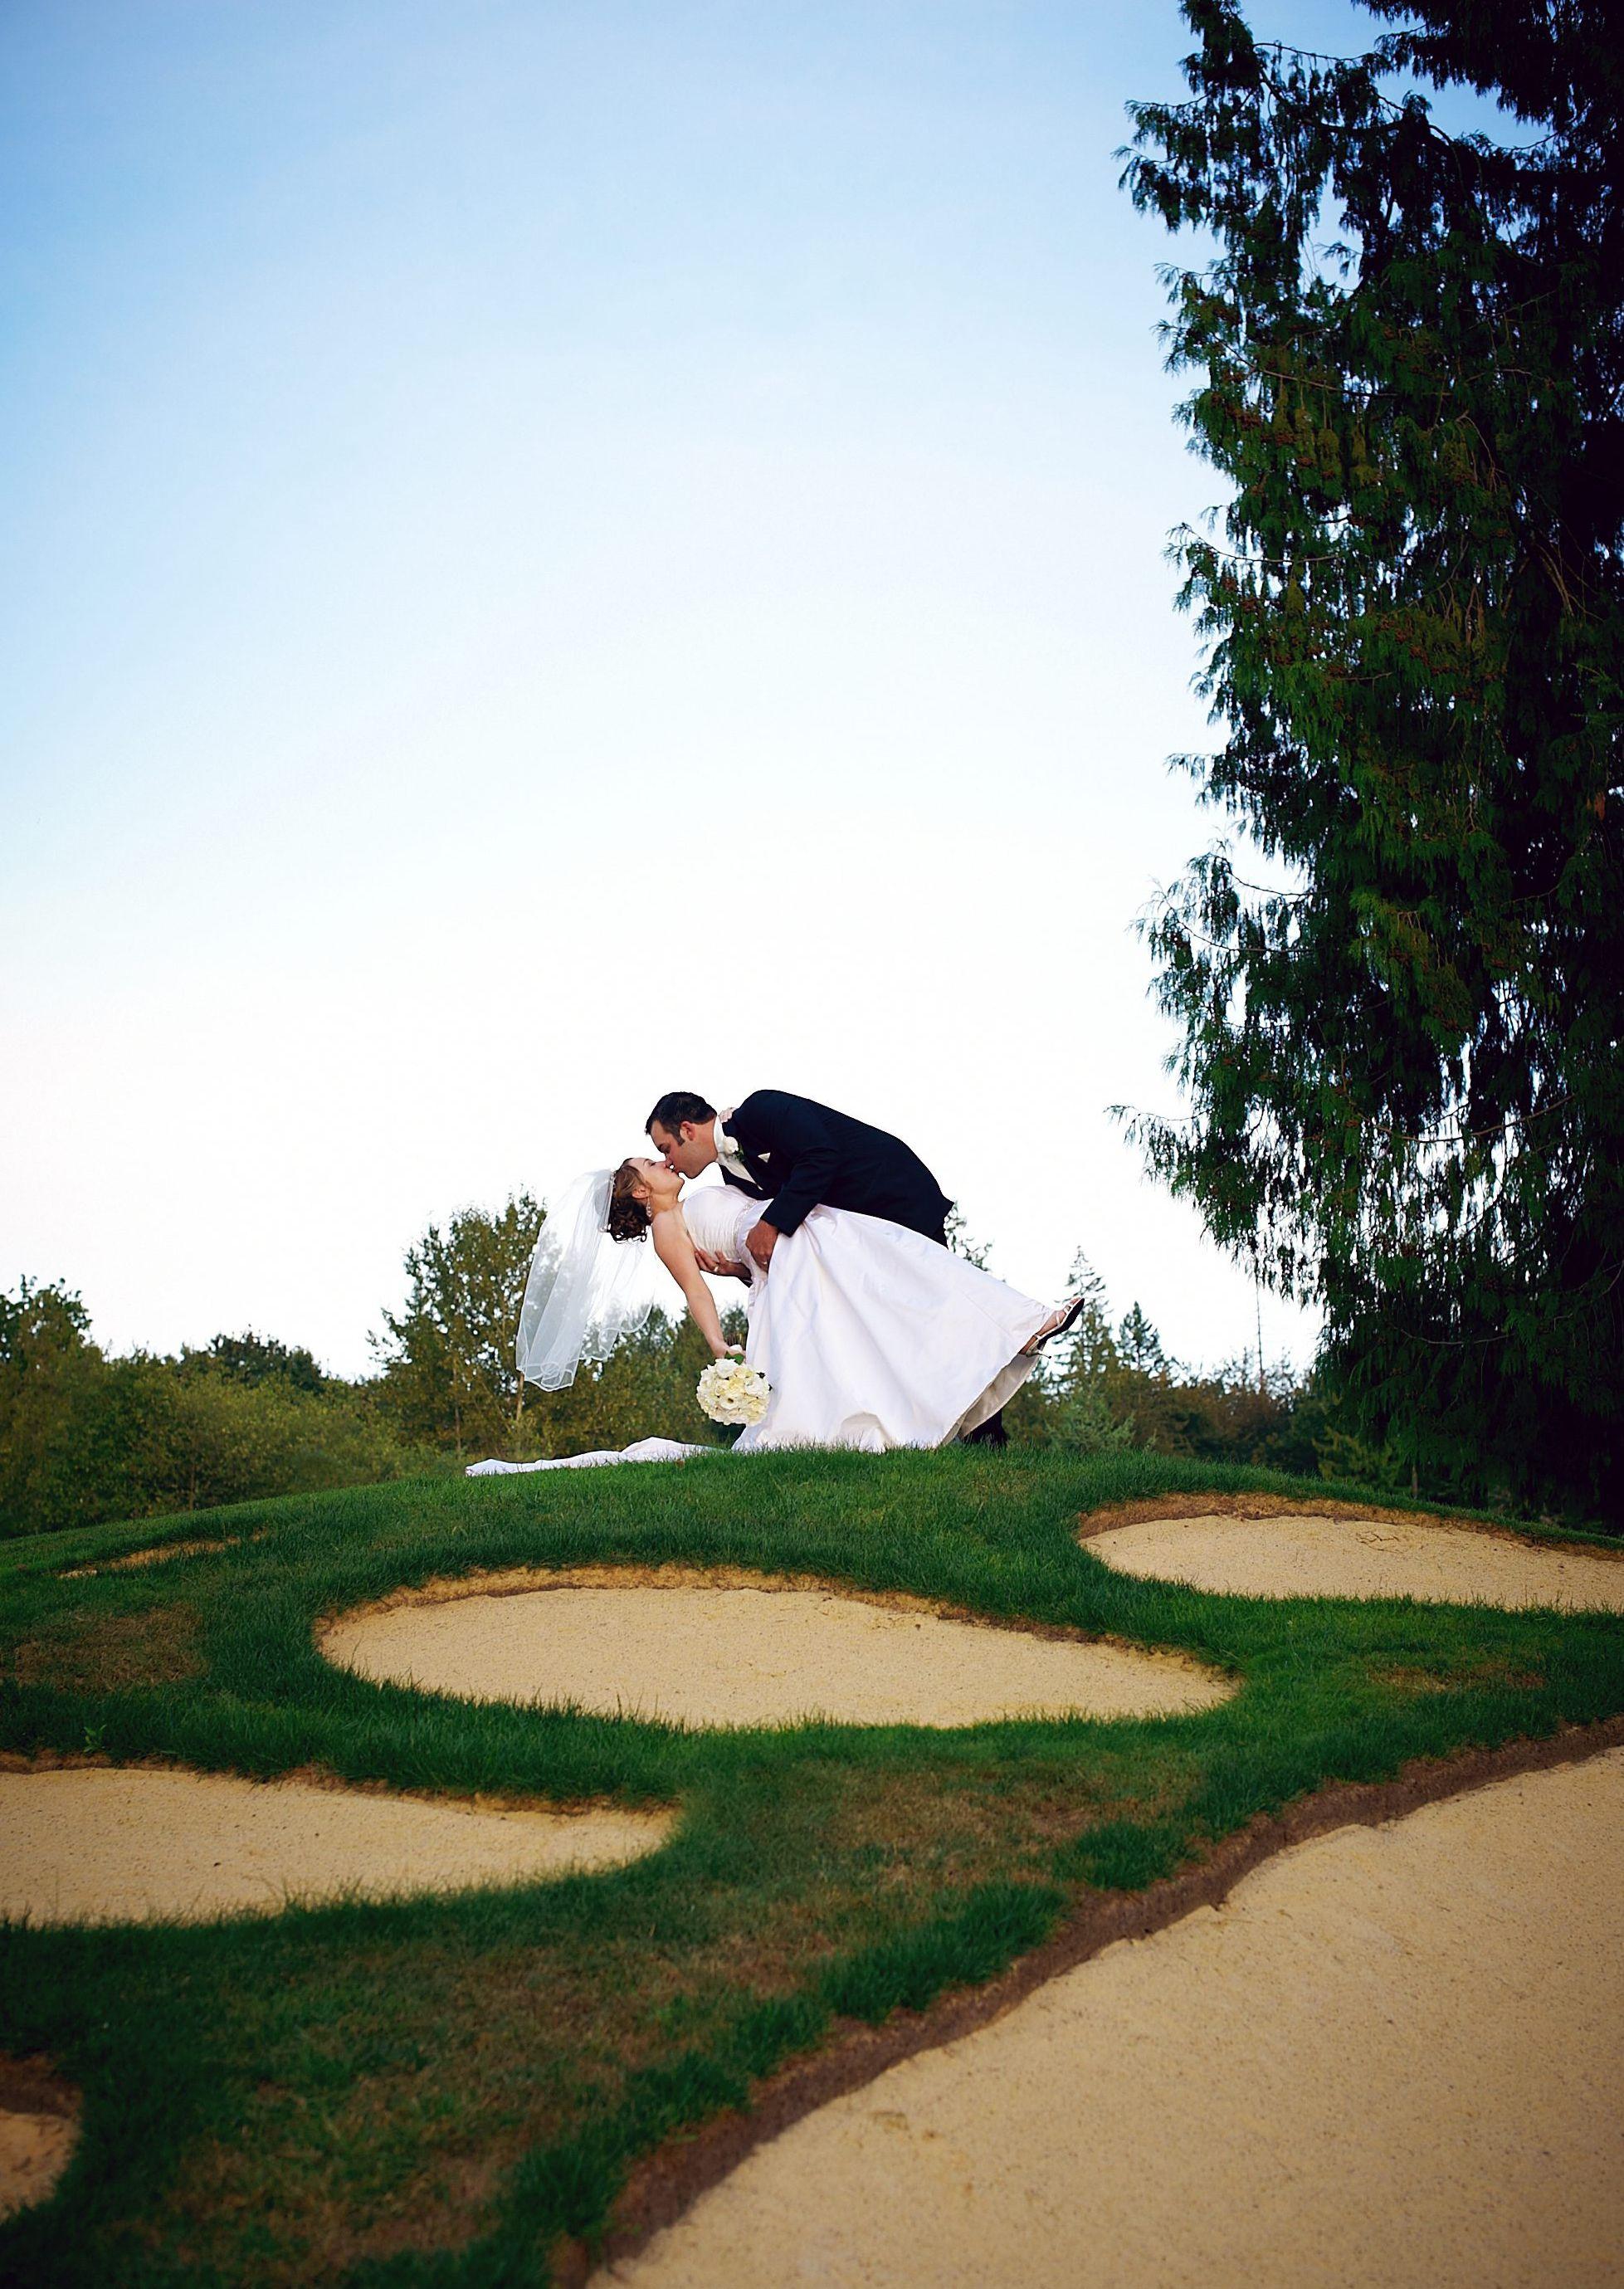 Woodinville wedding venues bear creek country club weddings